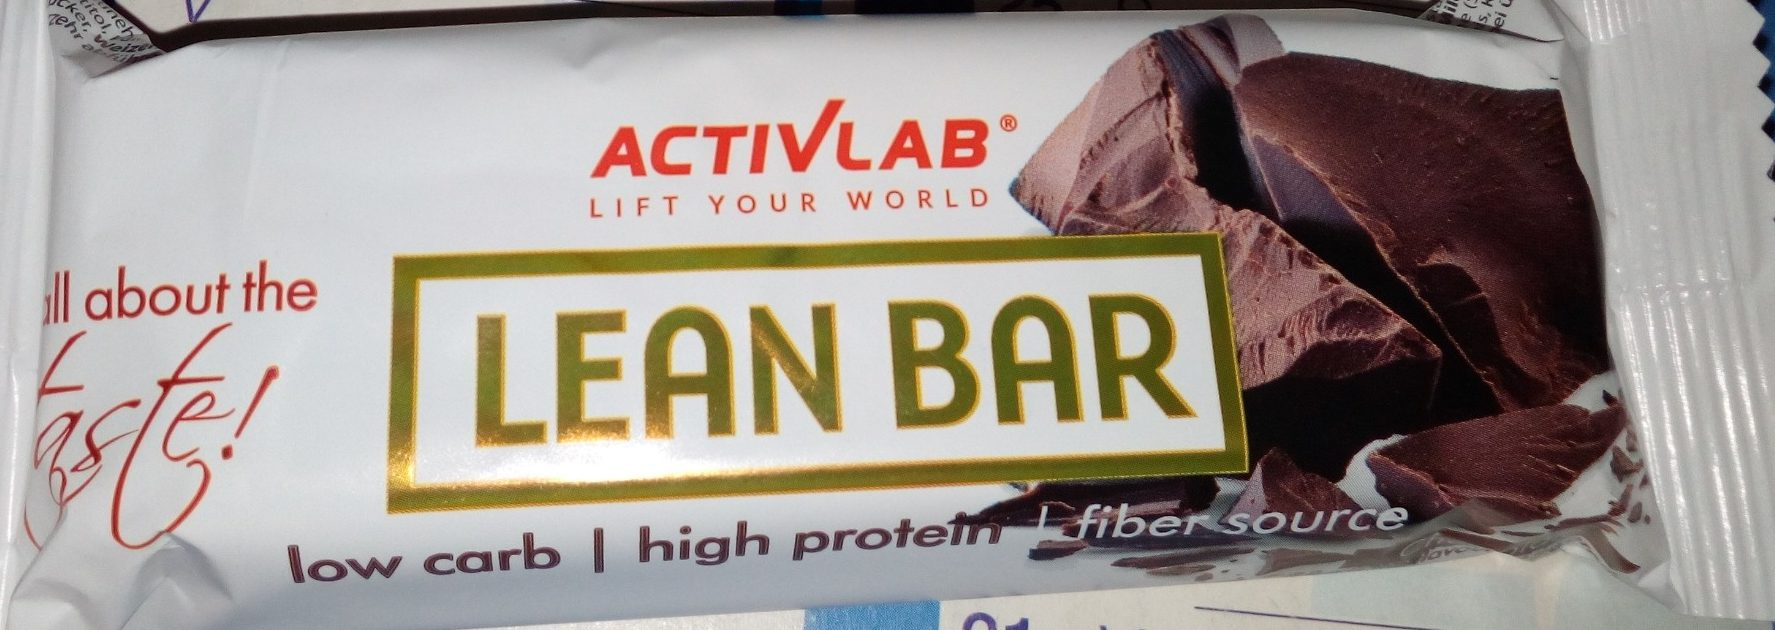 Lean bar chocolat - Product